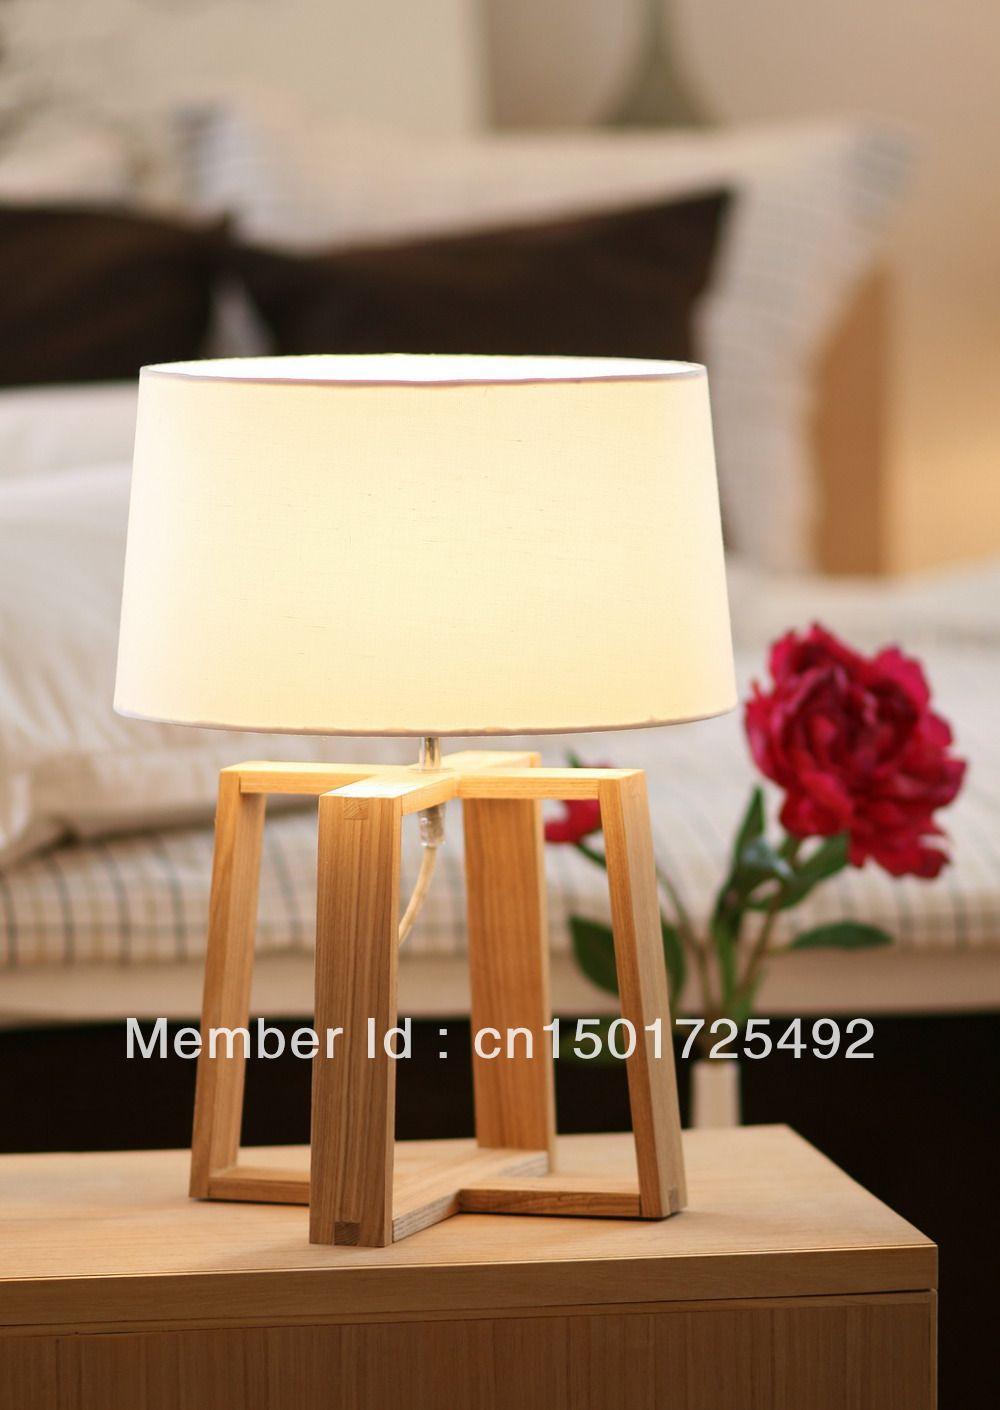 DIY WOODEN TABLE LAMP